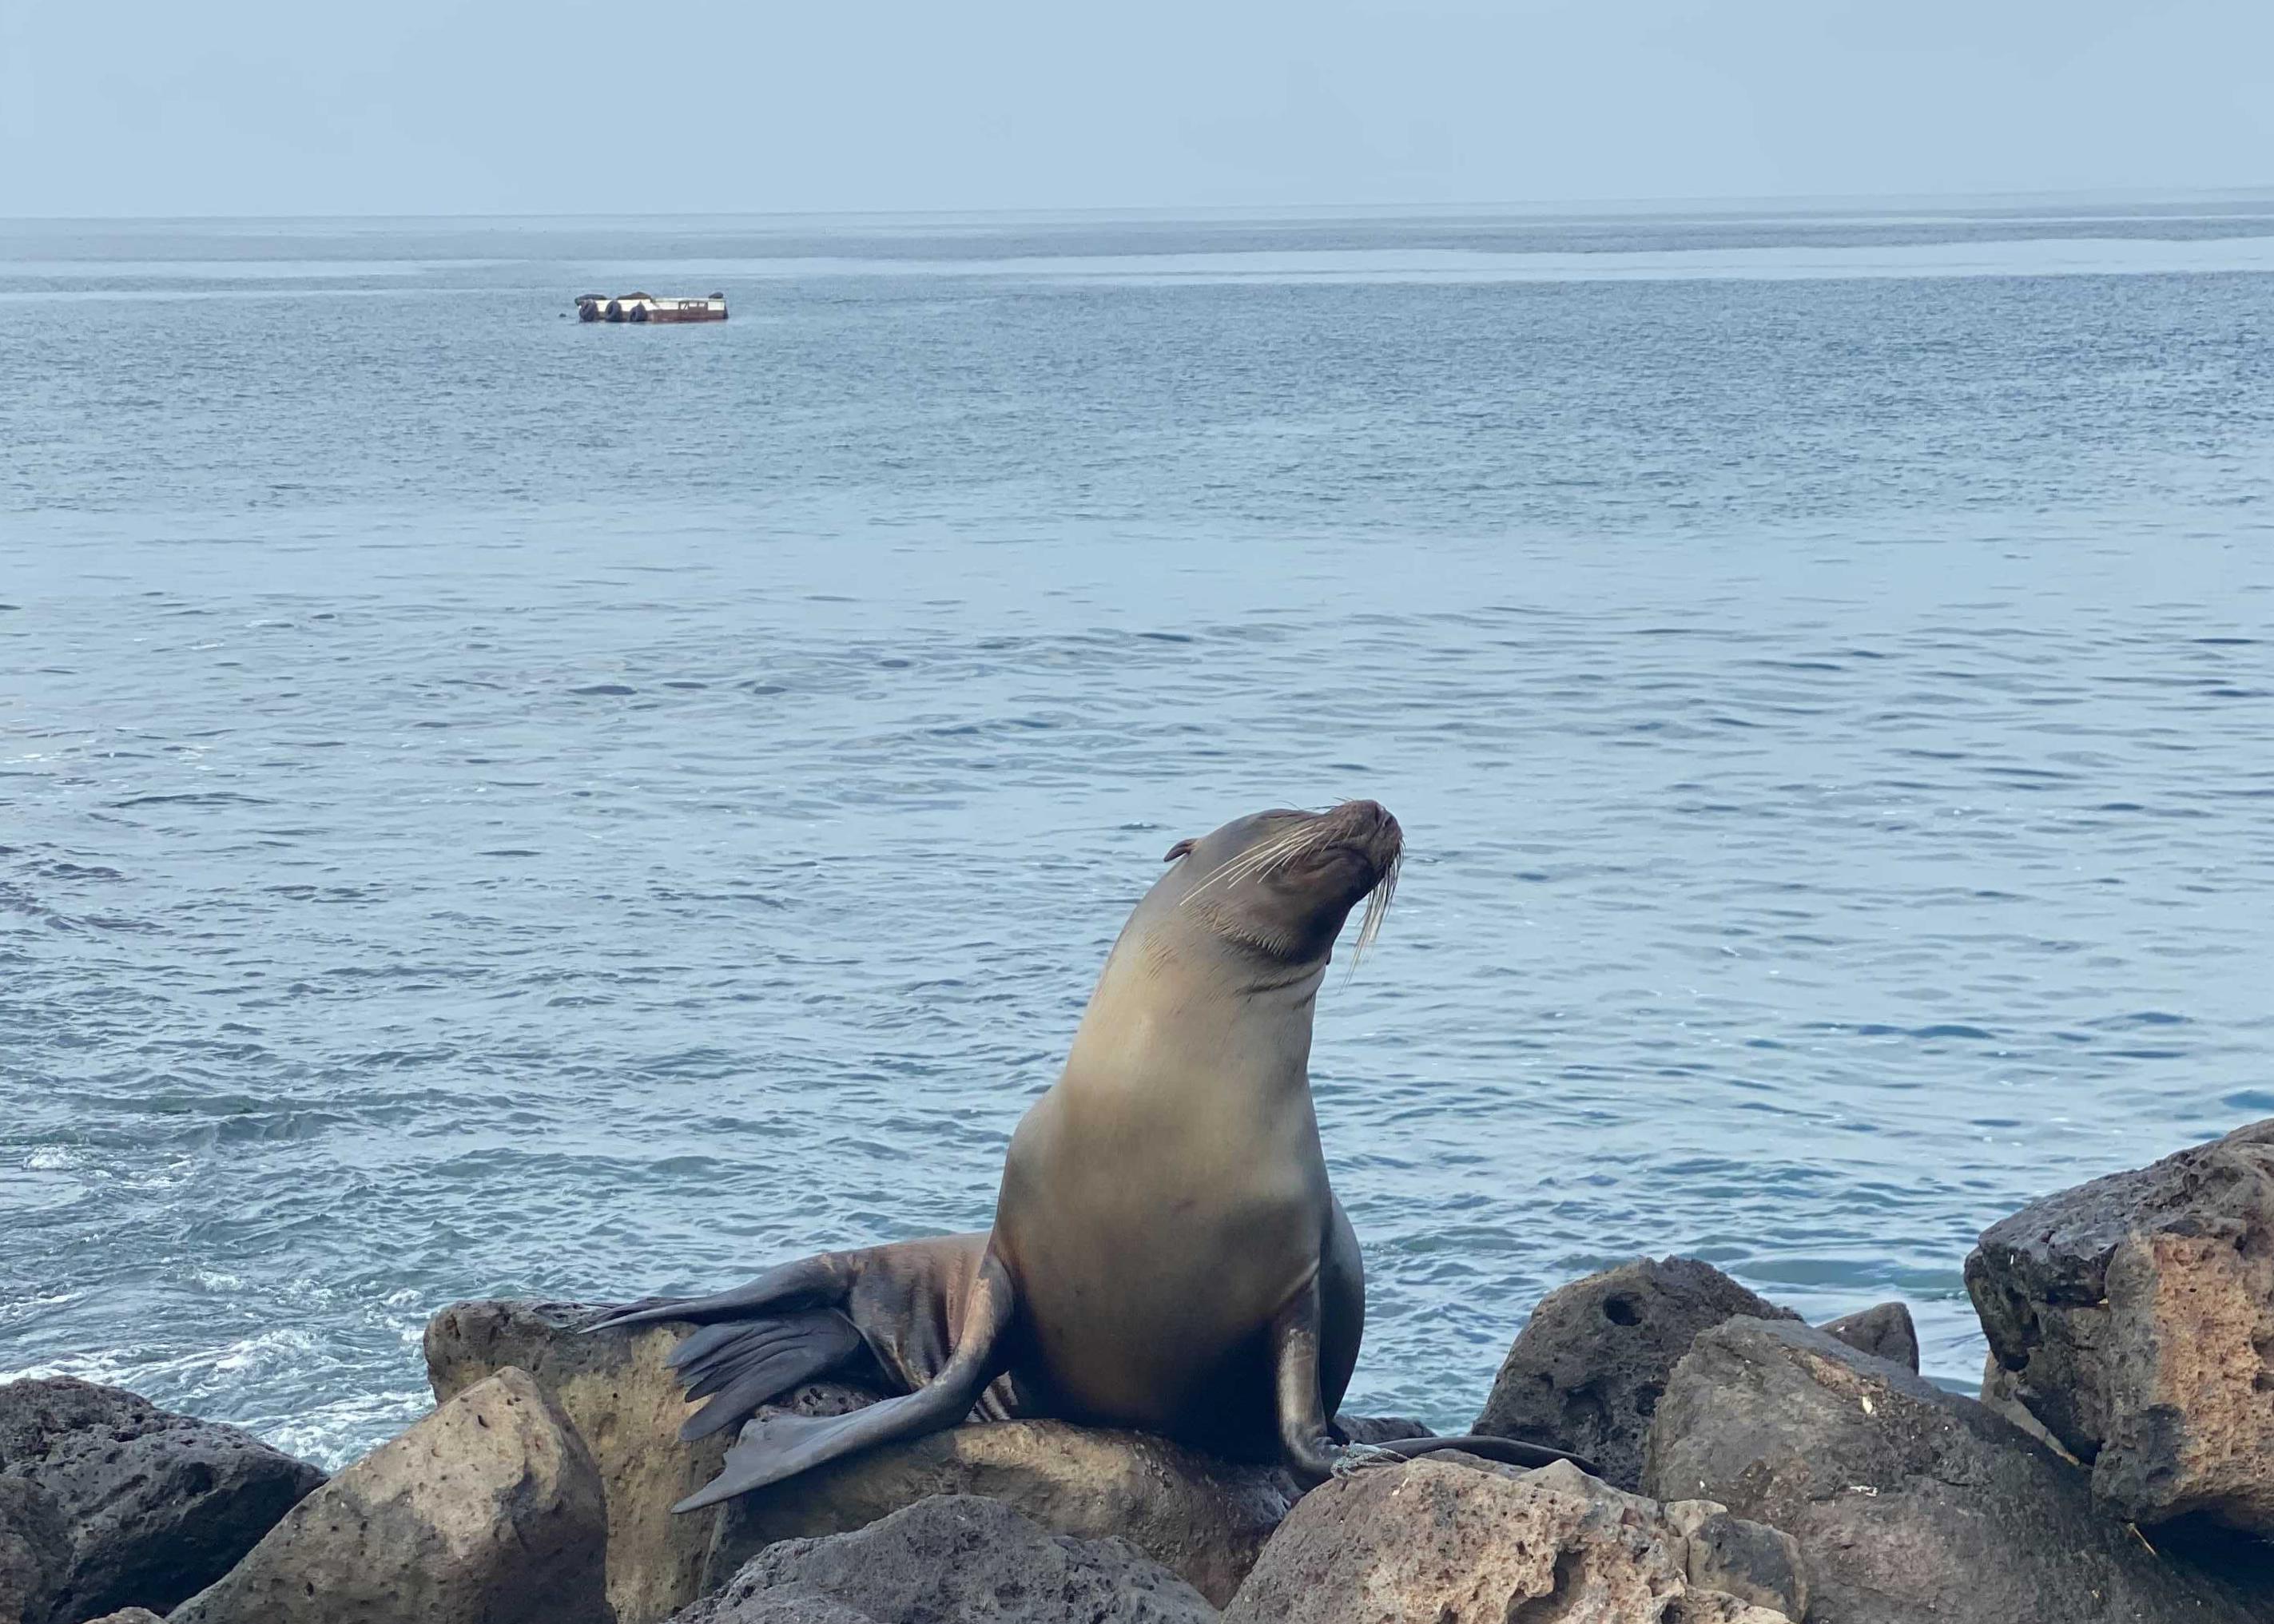 Galápagos sea lions lead an idyllic life on this small archipelago